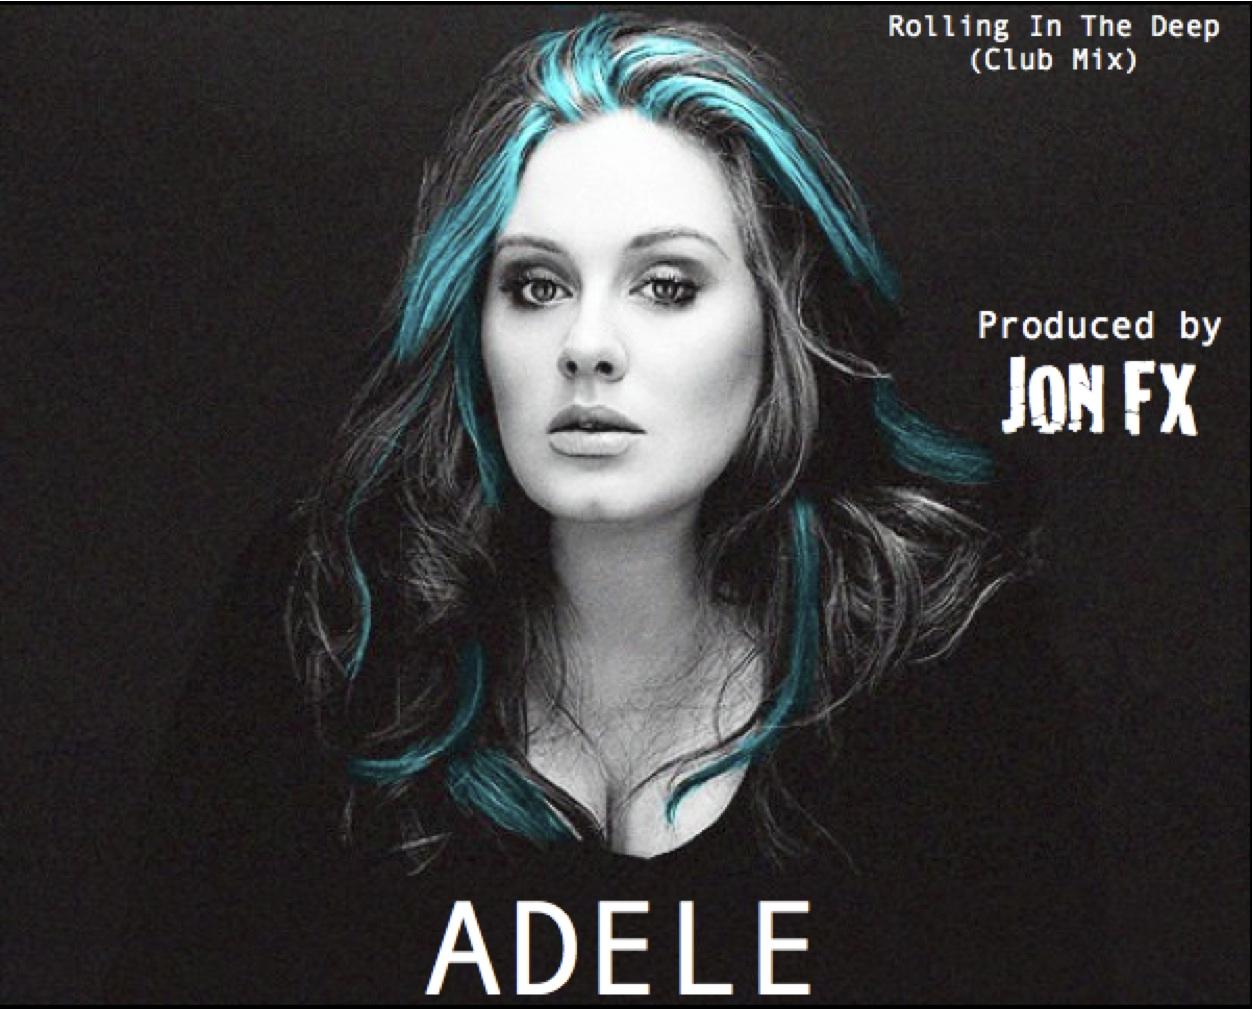 http://2.bp.blogspot.com/-74DkpPVKwFY/Td5ZsTW-xlI/AAAAAAAADKA/x8_68ygVrLs/s1600/Adele+Album+With+JonFX.jpg